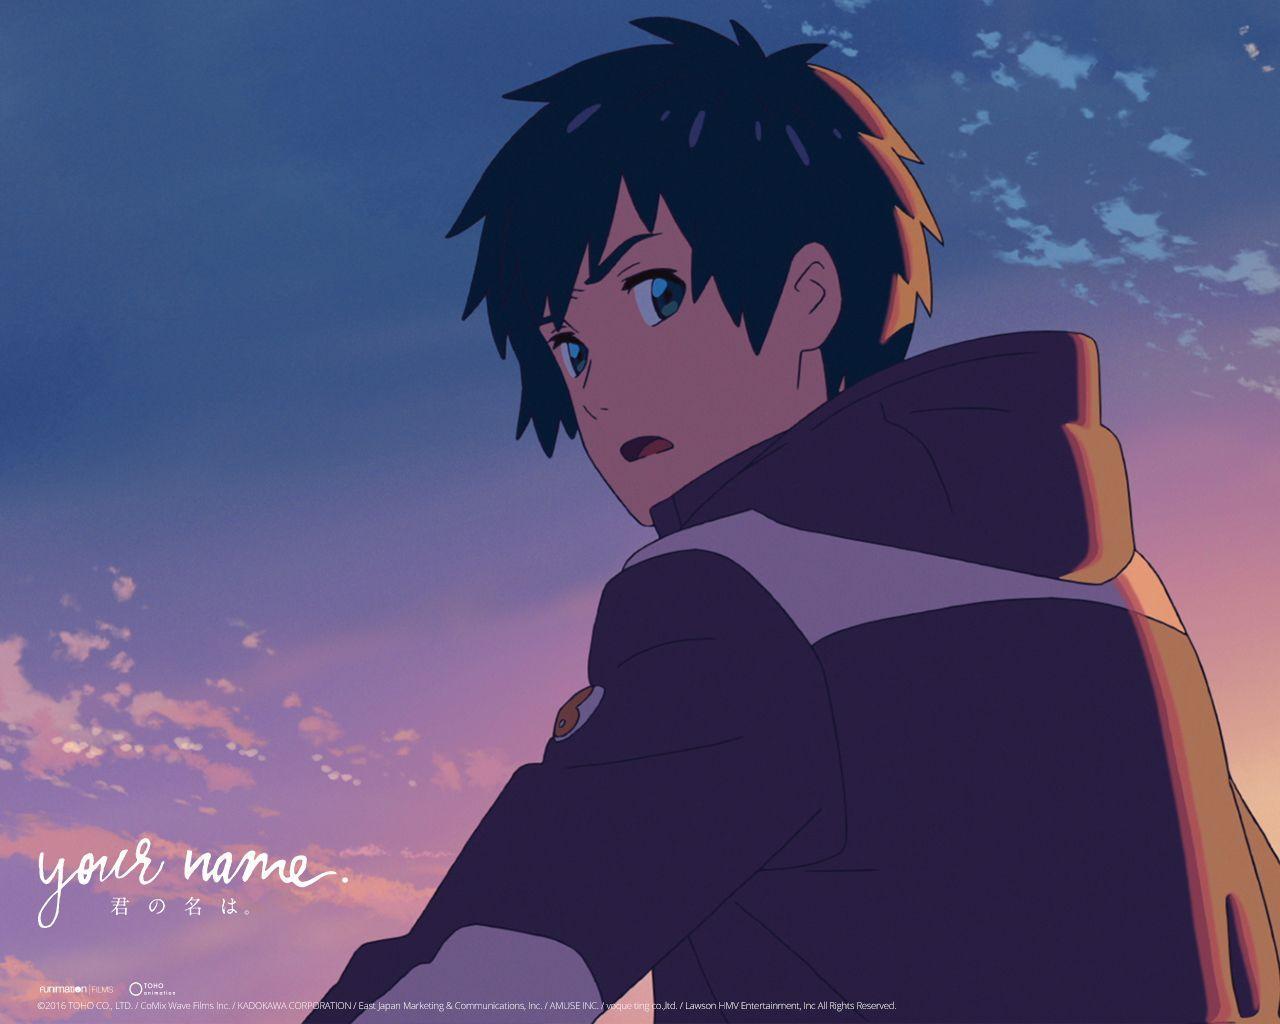 Your Name Anime 2016 Wallpapers Top Free Your Name Anime